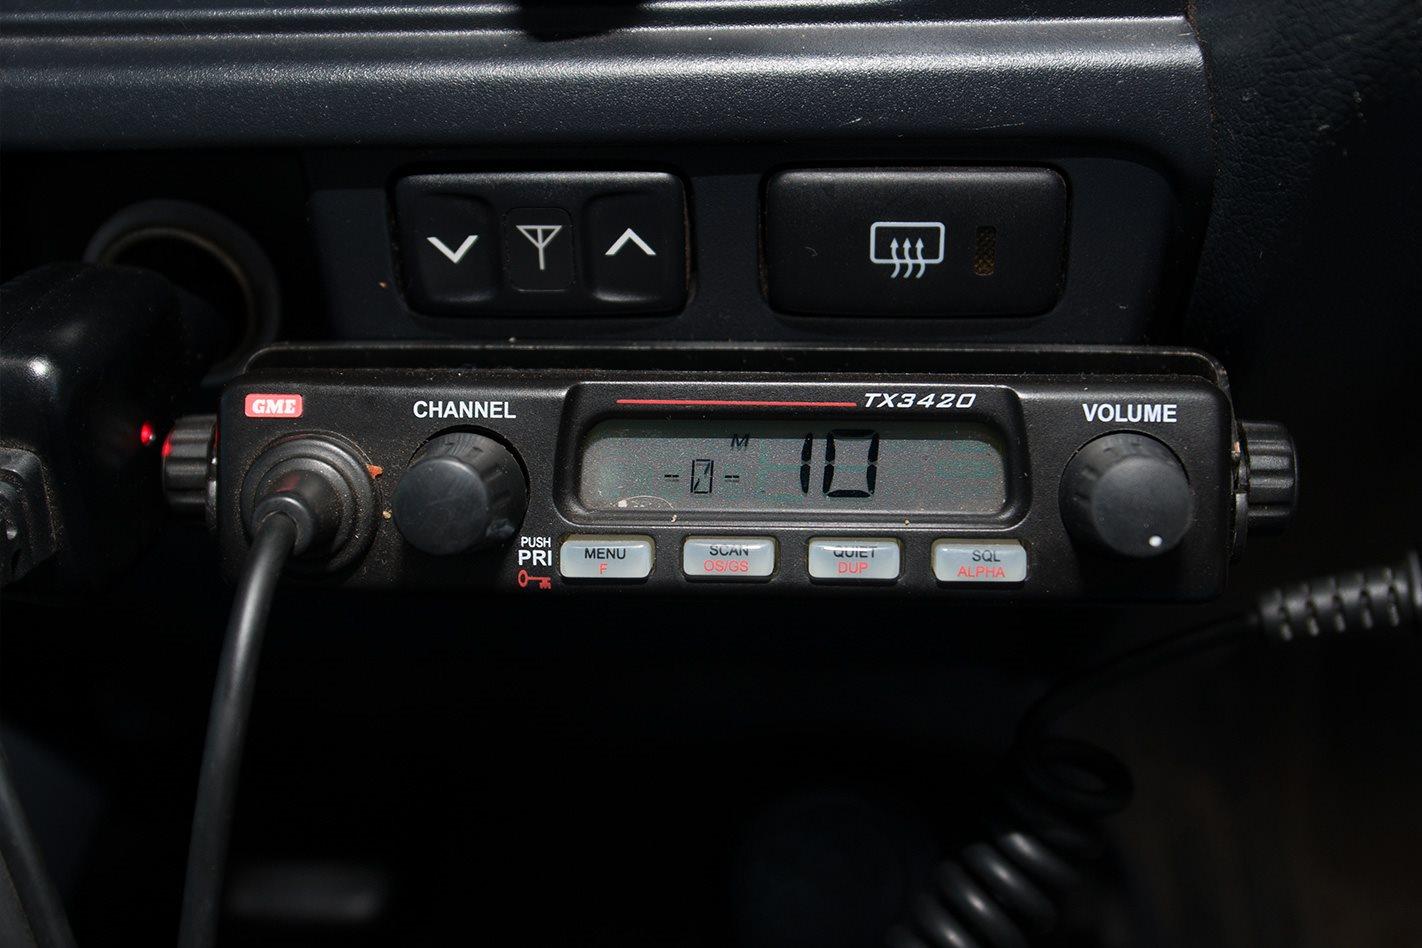 2010-Toyota-Land-Cruiser-76-Series-radio.jpg